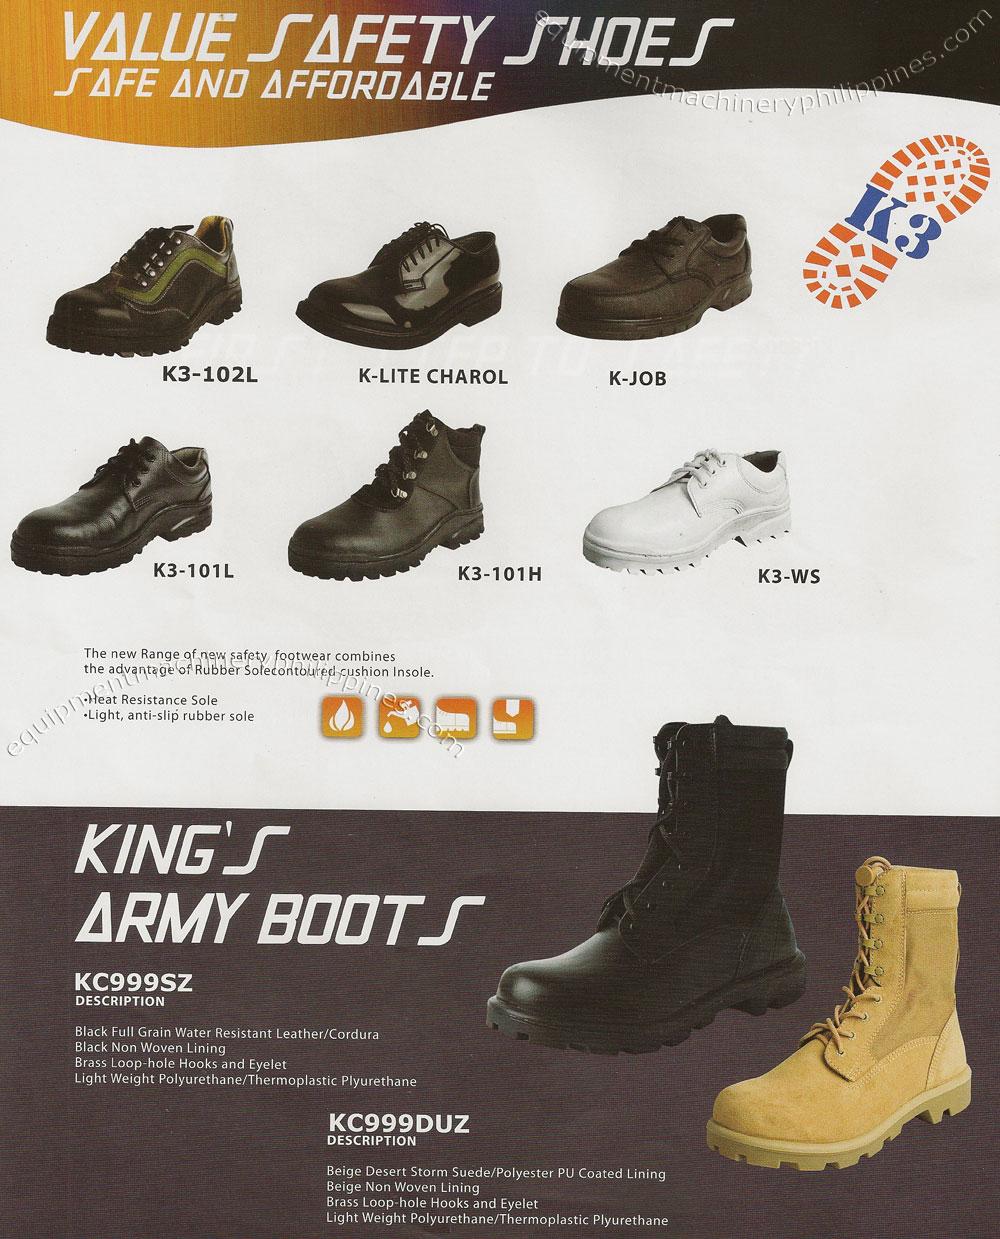 Kings Safety Shoes Distributor Philippines - Style Guru Fashion Glitz Glamour Style Unplugged